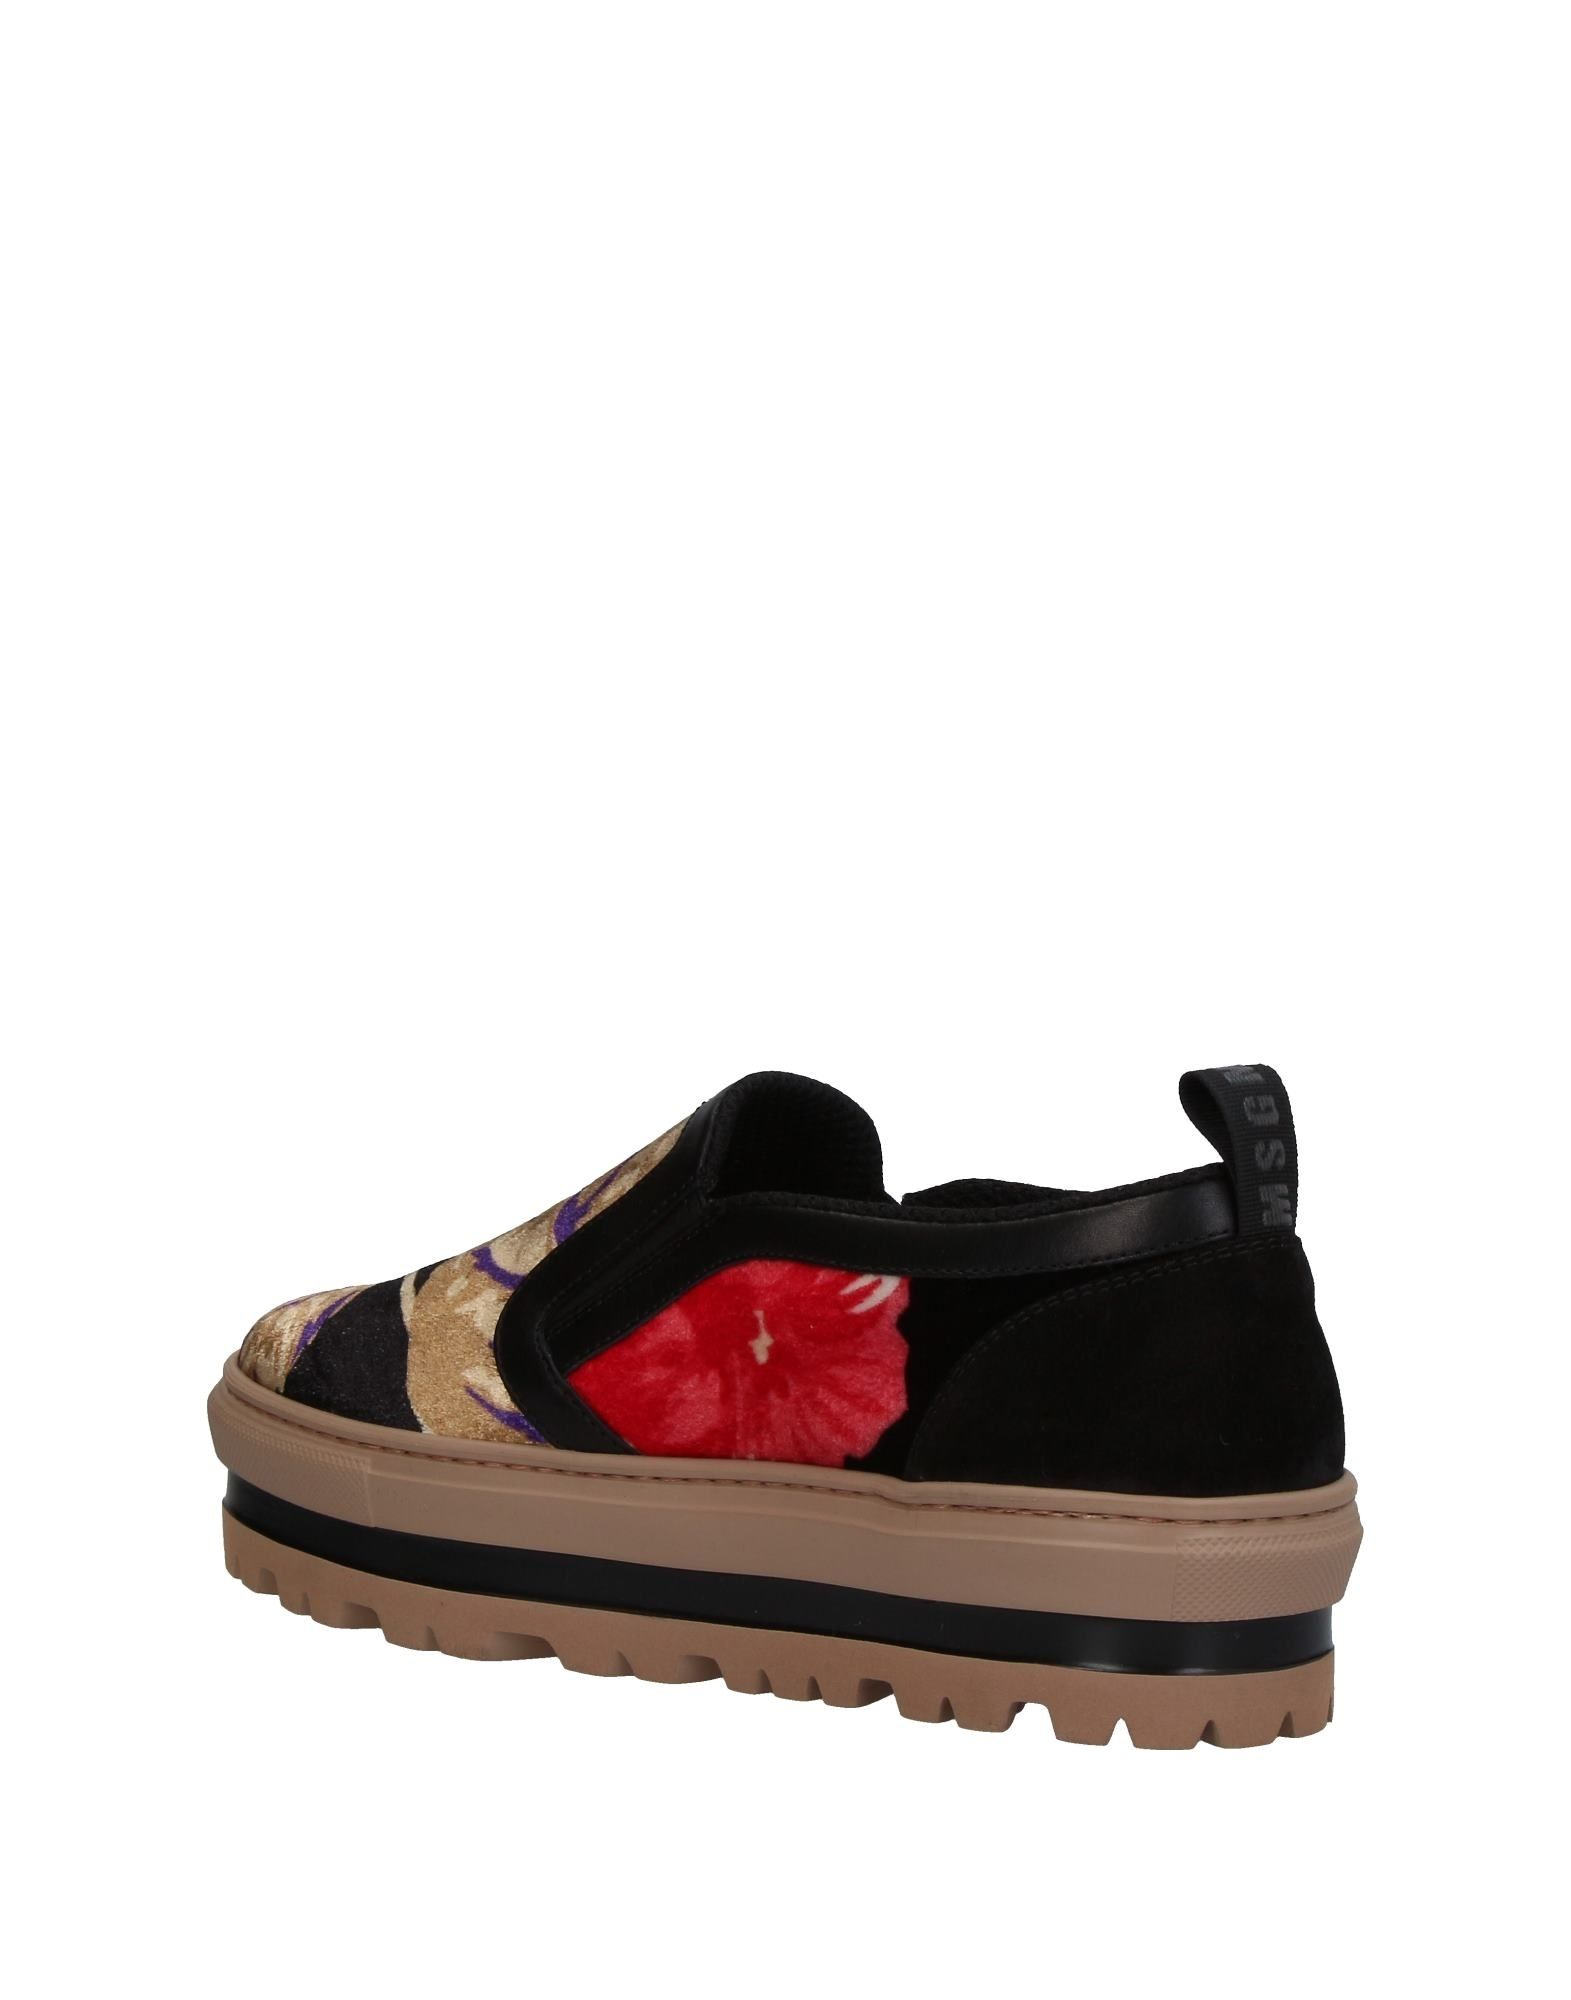 Msgm Sneakers Damen  11414839NE Gute Qualität beliebte Schuhe